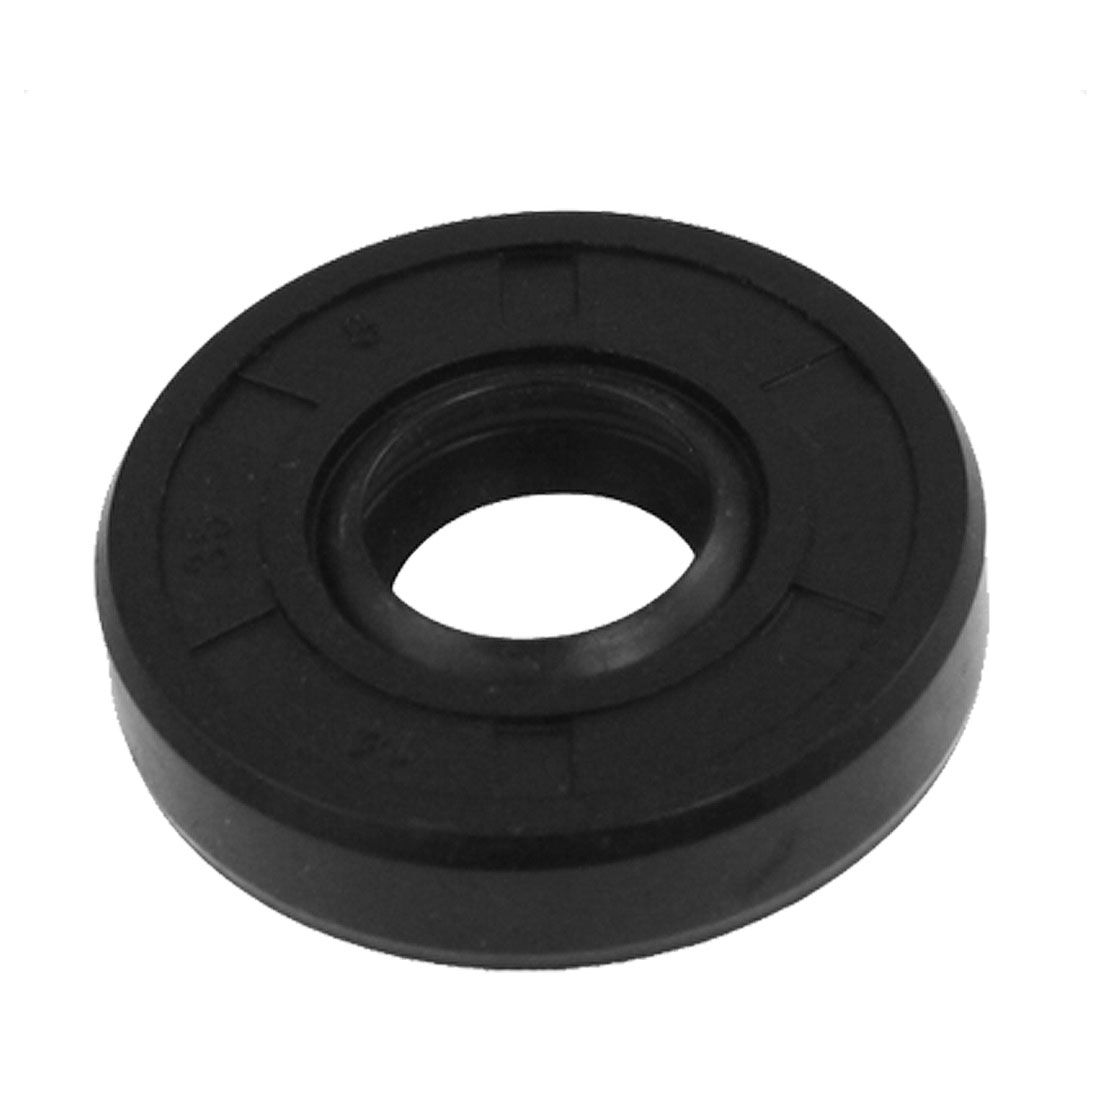 Metric Rotary Shaft Oil Seal 20 x 47 x 7 20x47x7mm TC Double Lipped